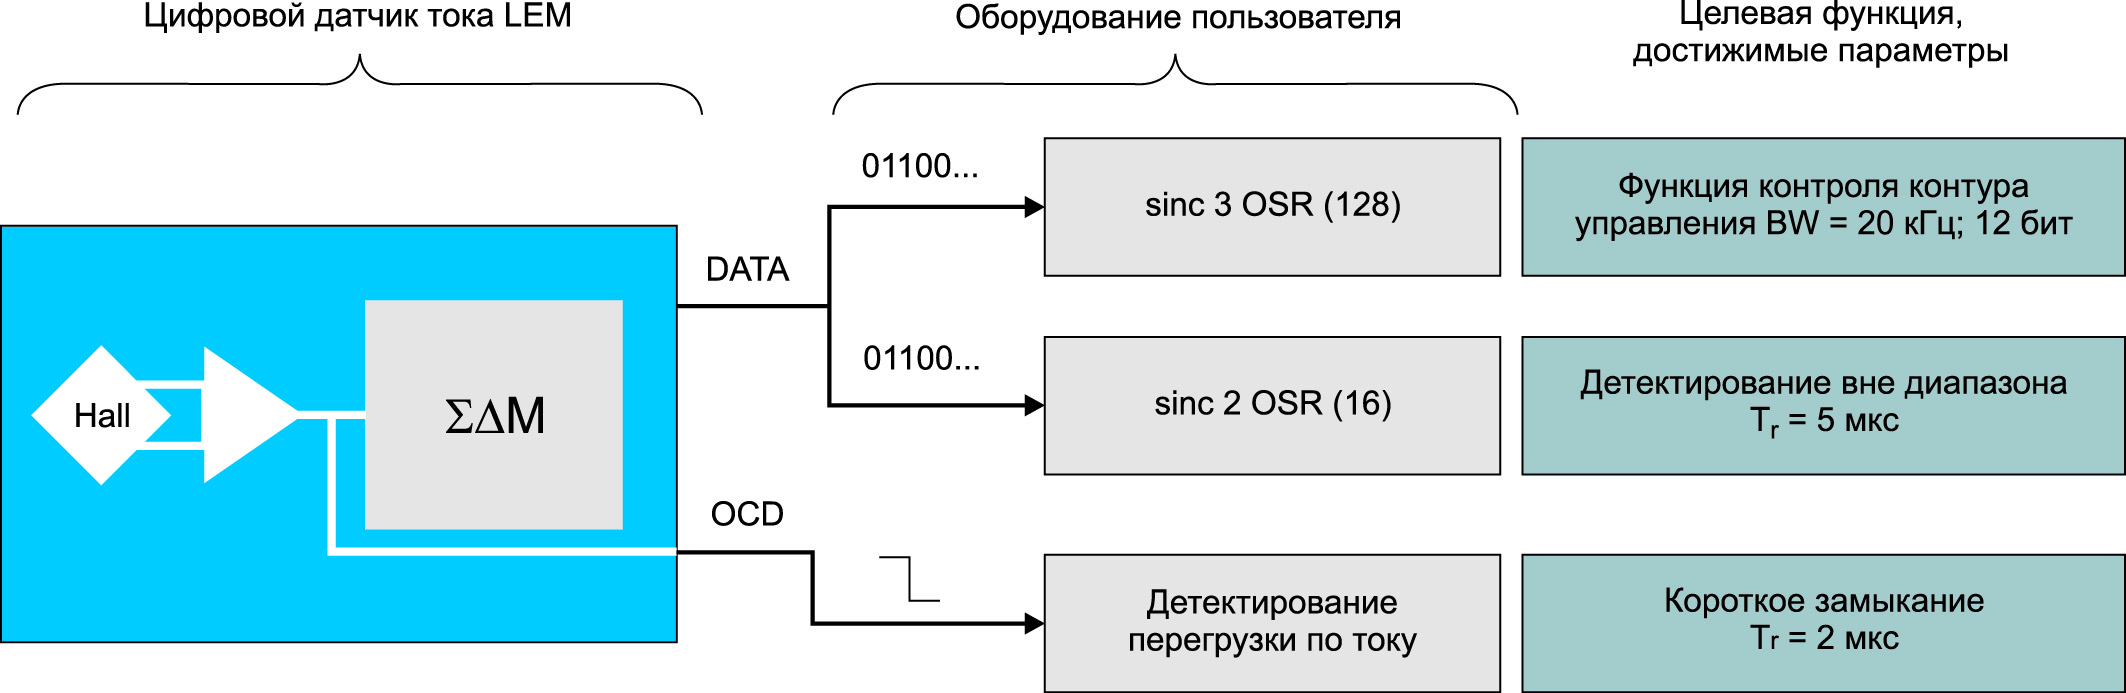 Пример реализации, влияние OSR и порядка фильтра на время отклика и разрешение